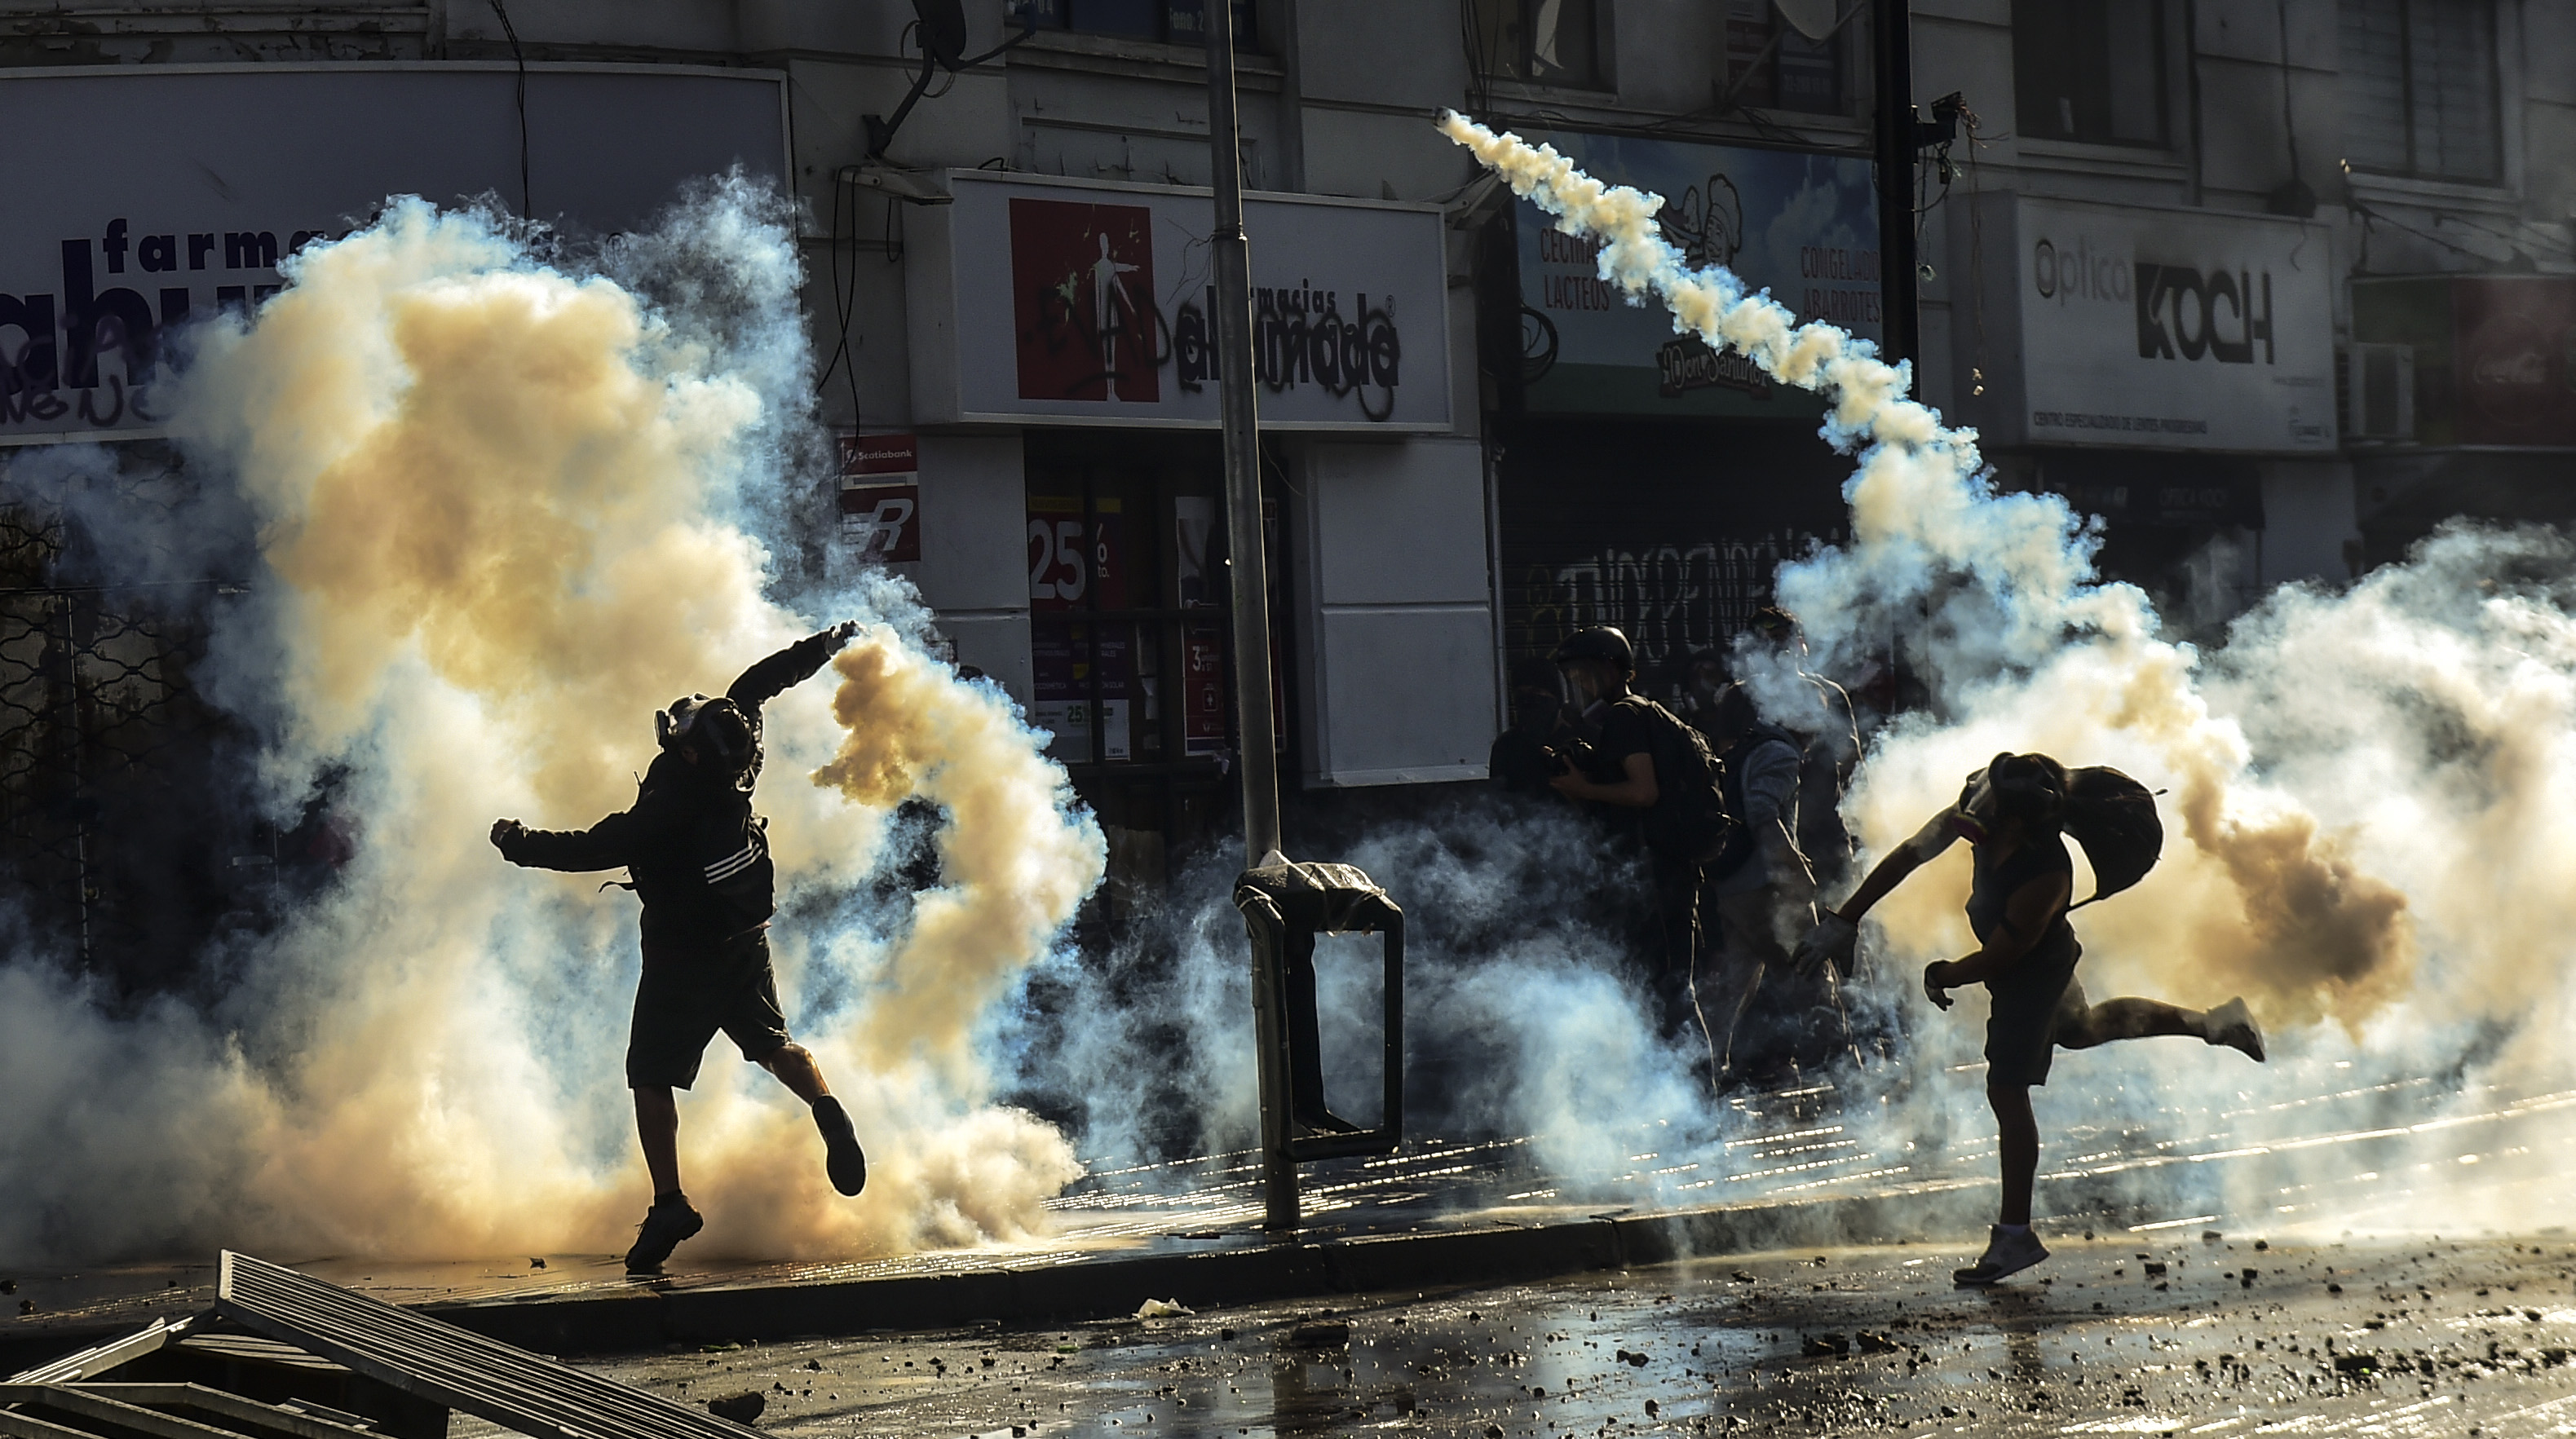 protestasAAProtestas chile_59